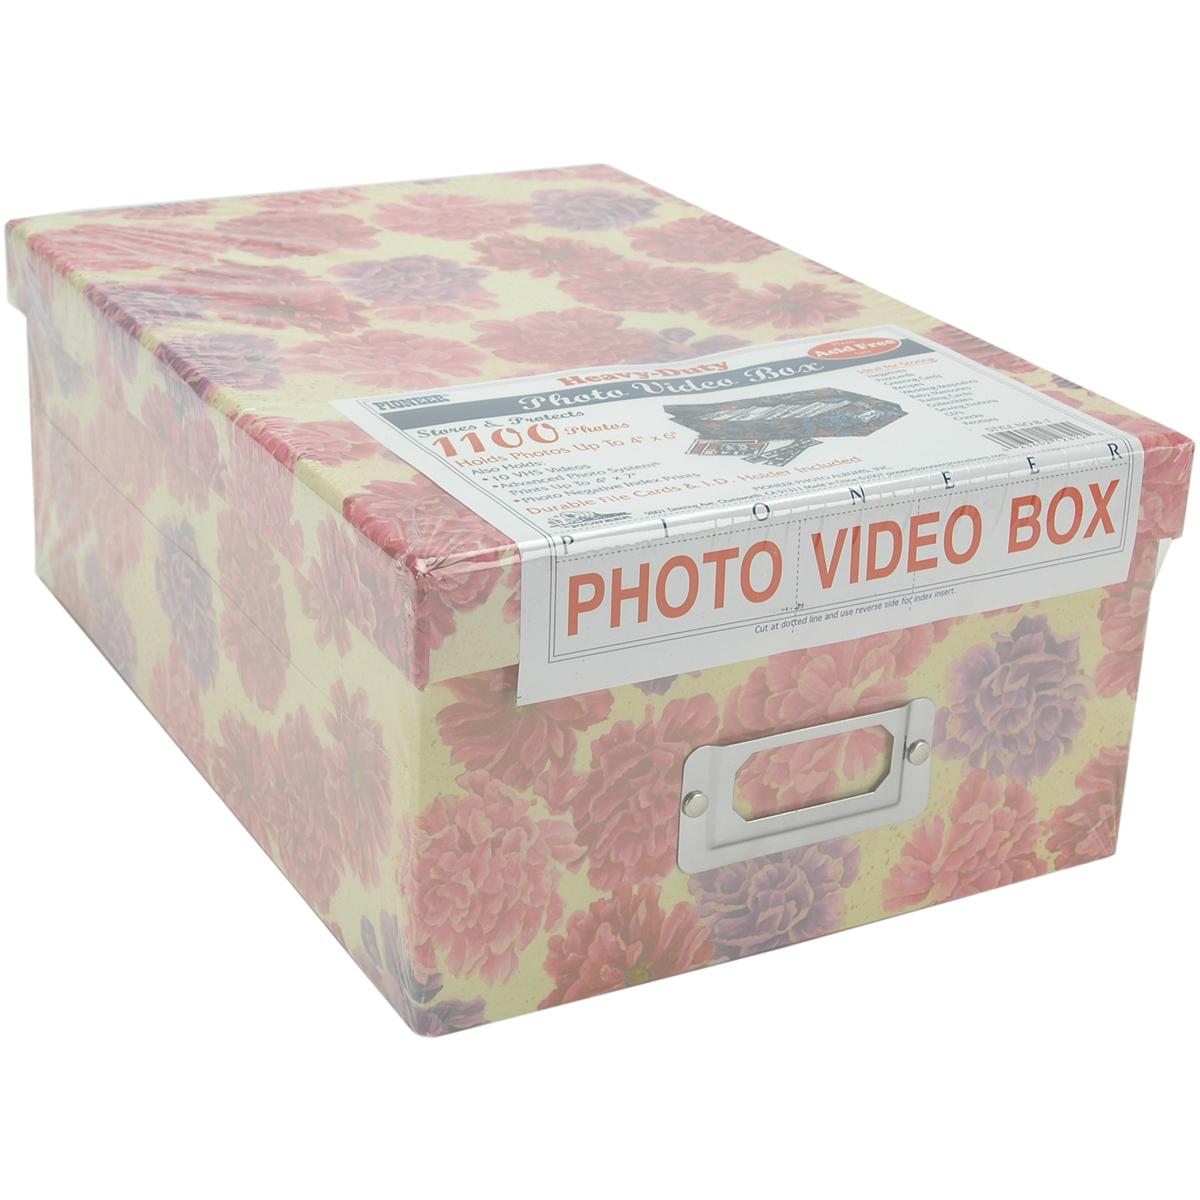 PHOTO STORAG BOX AST